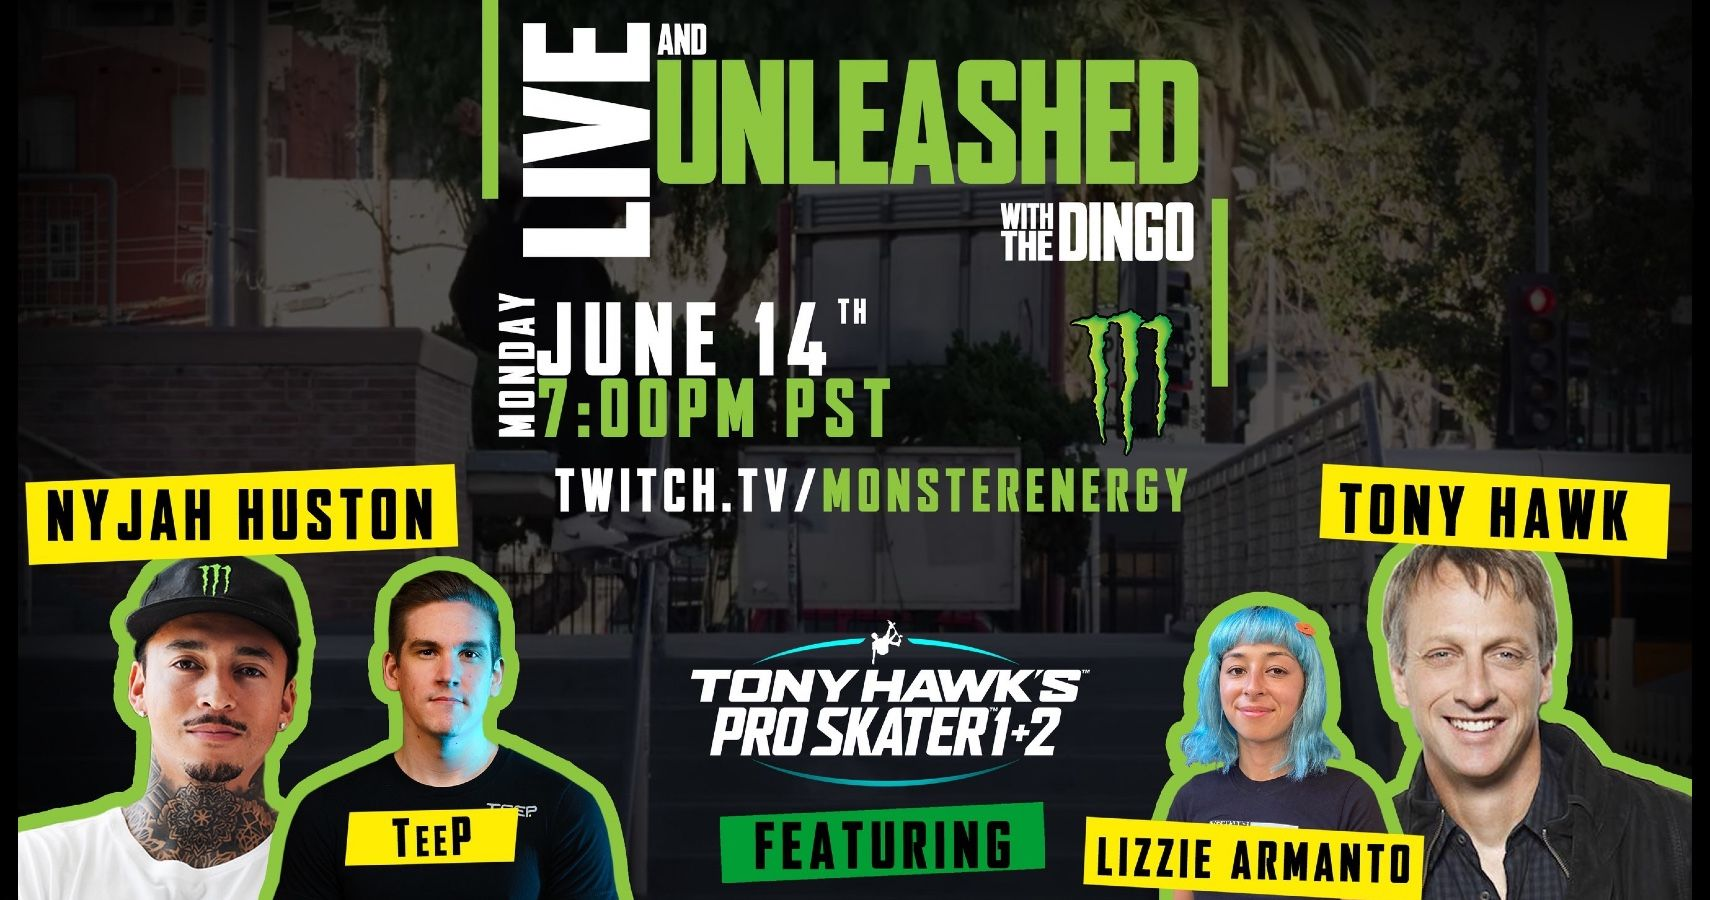 Watch Tony Hawk Compete In Tony Hawk's Pro Skater 1 + 2 On New Twitch Series